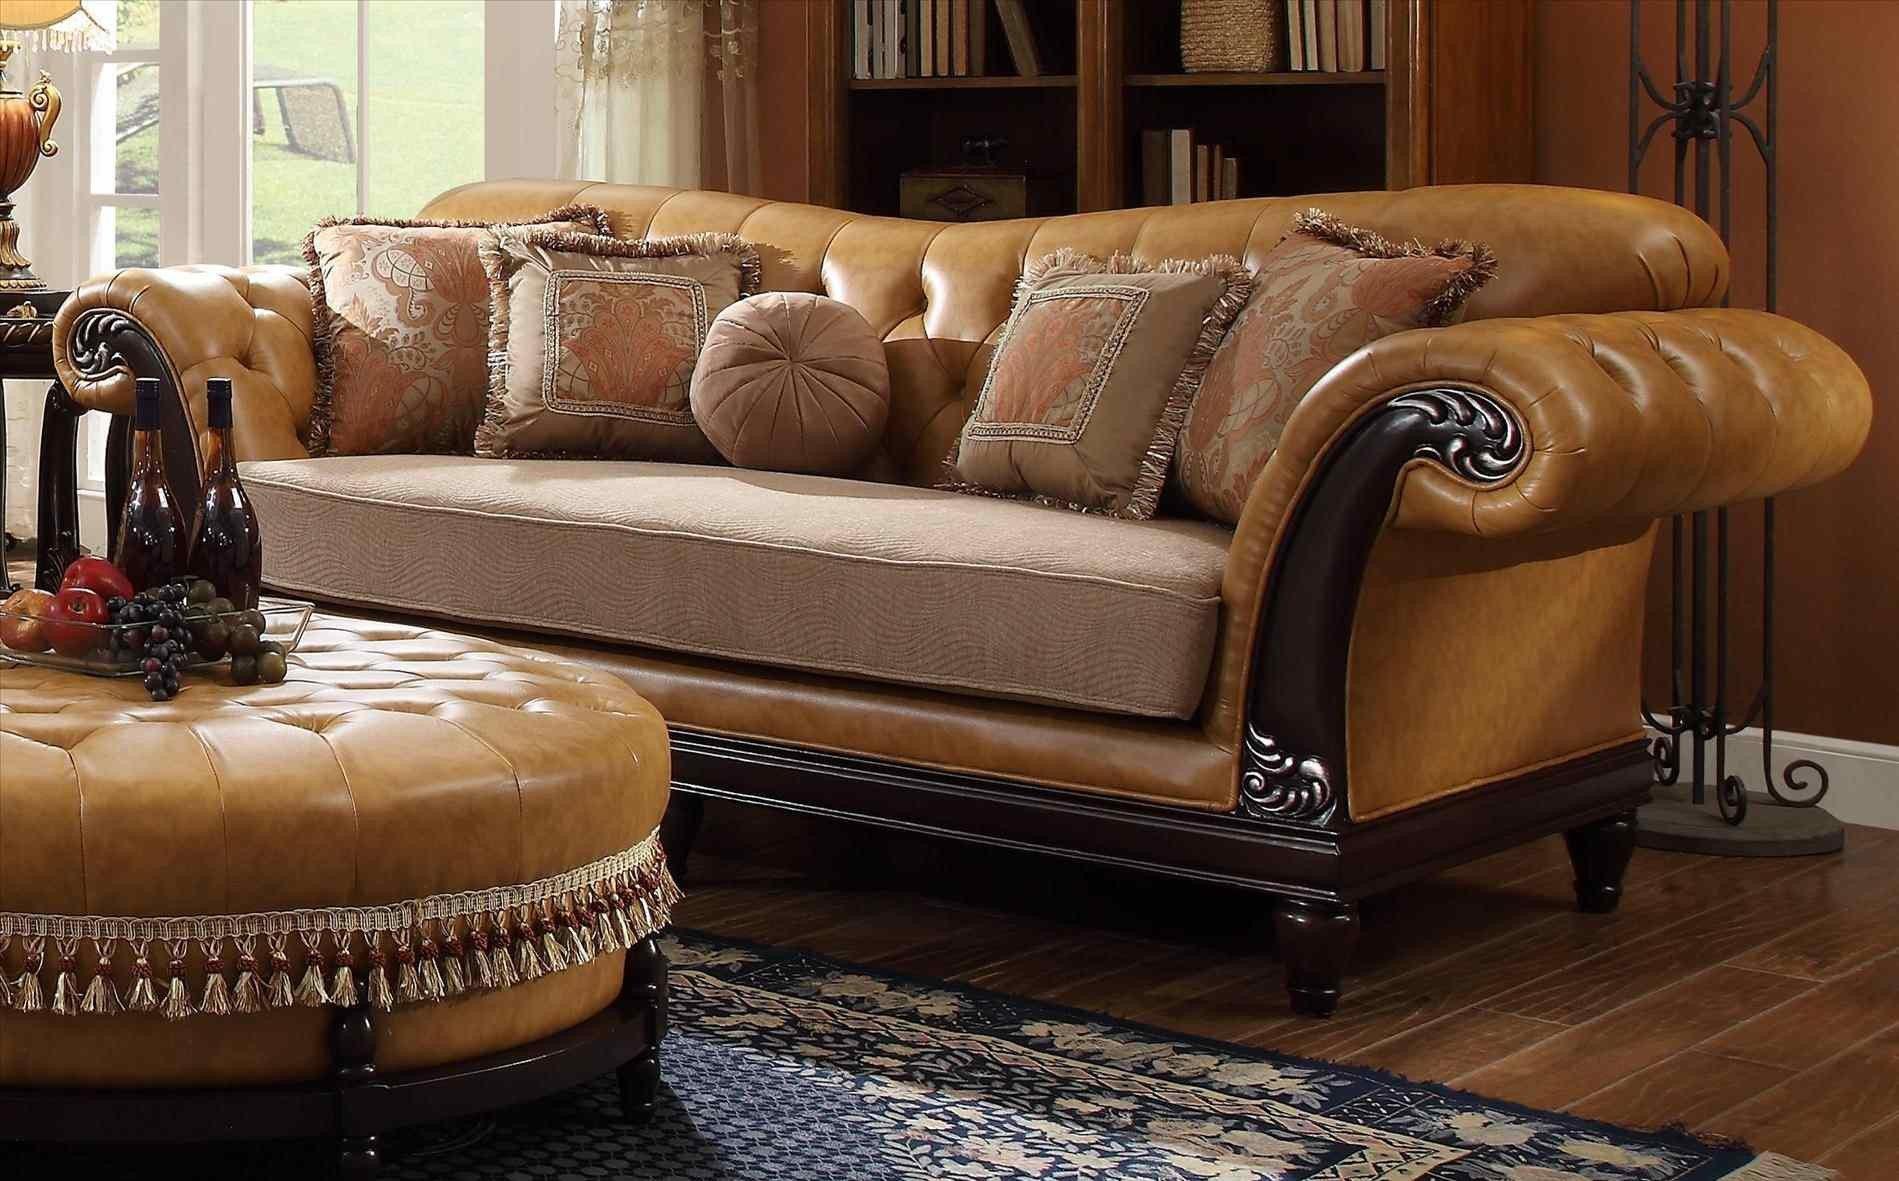 Comfortable Living Room Victorian Elegant Modern Ideas Victorian Lounge Elegant formal Living Room Furniture Traditional Tuscan Classic